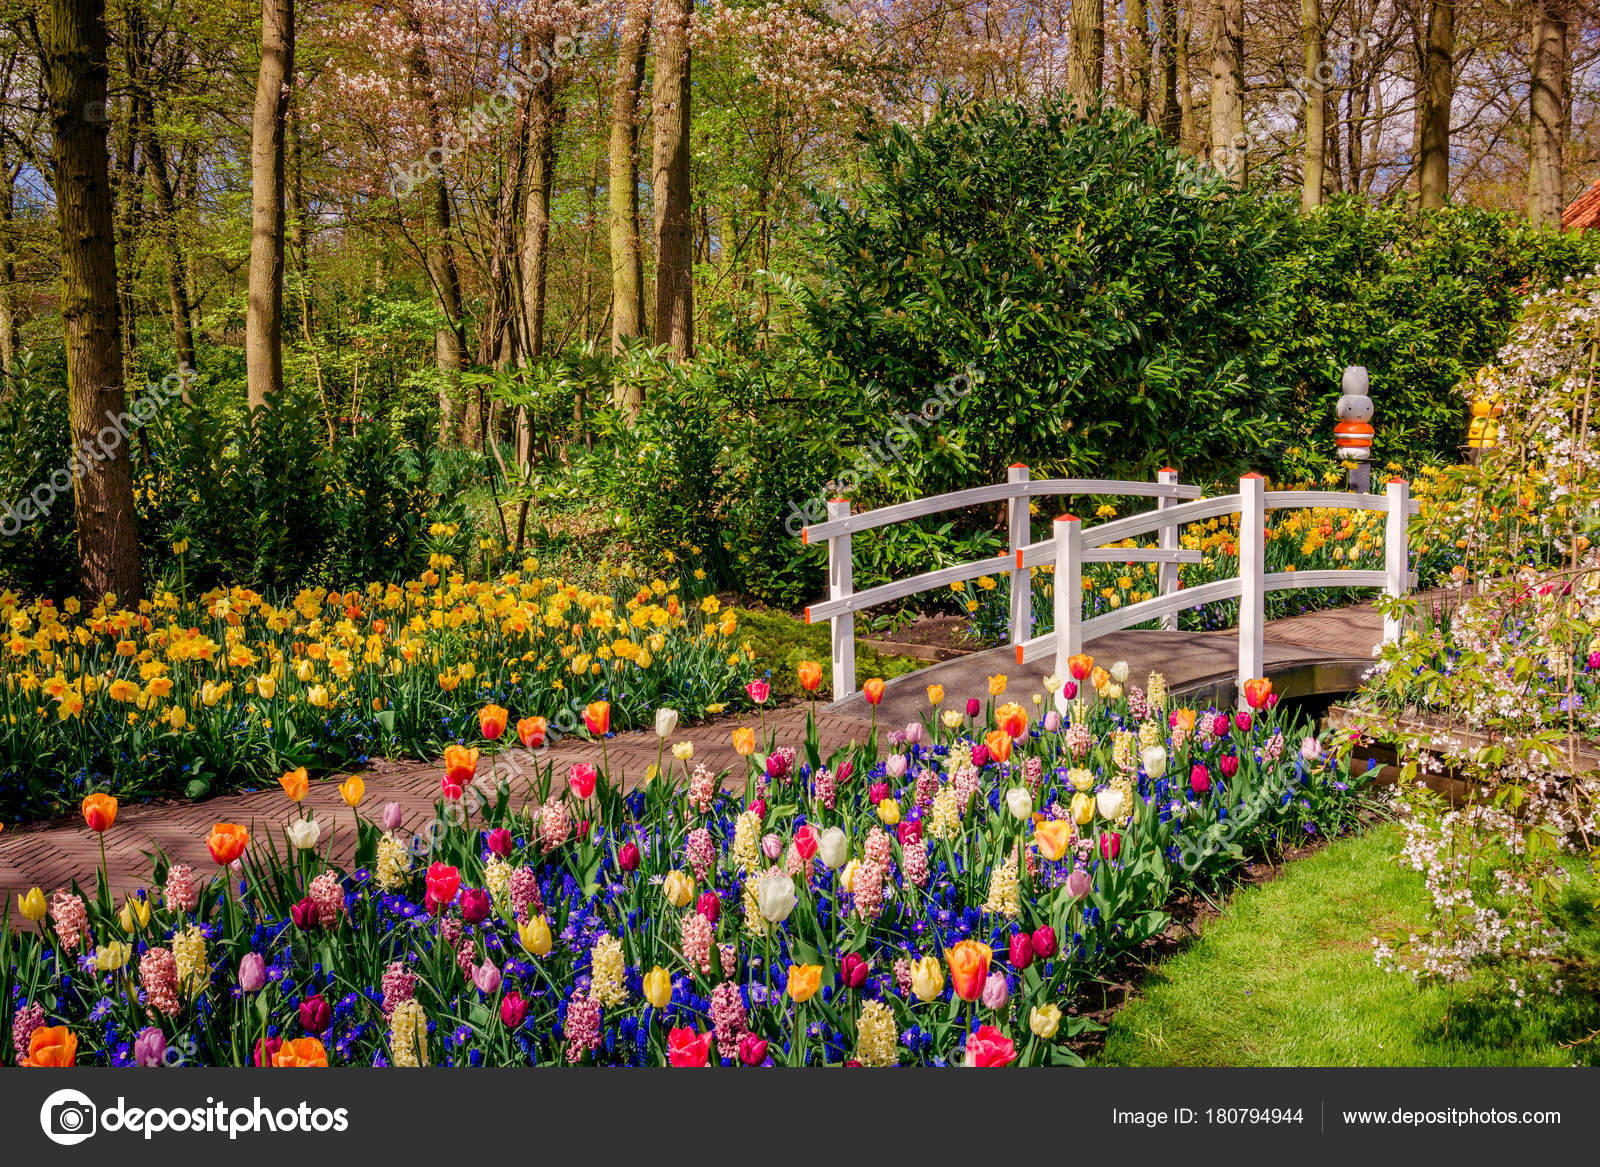 Imagenes De Paisajes De Primavera: Imágenes: Paisajes Hermosos De Primavera